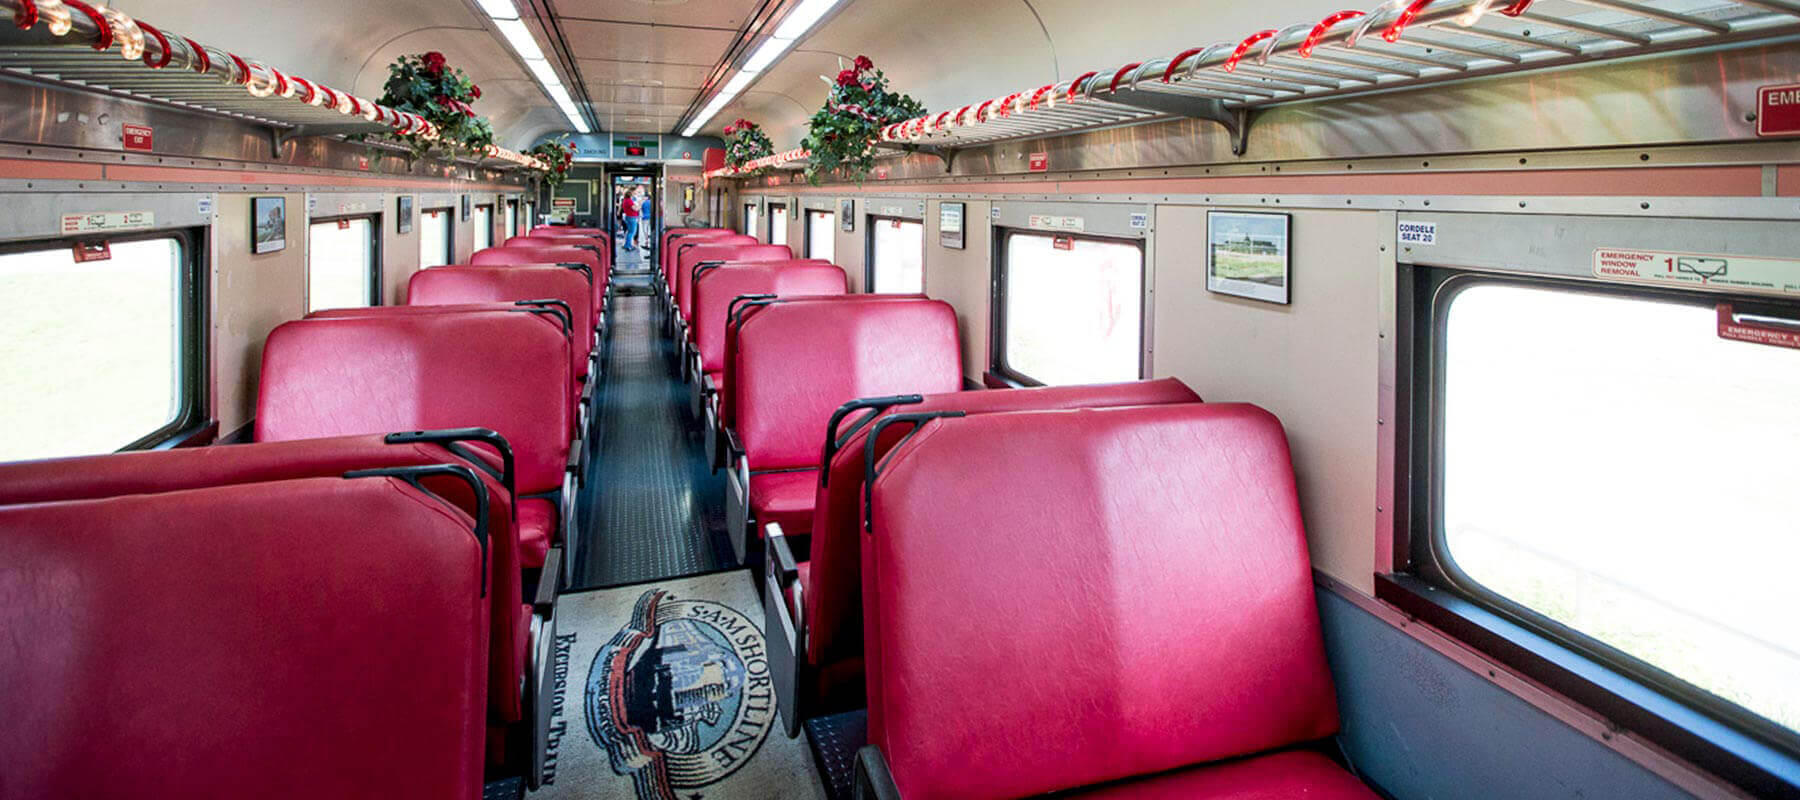 Lake-Blackshear-Georgia-Train-Excursions-GA-Veterans-Park-SAM-Shortline-Train-Slider-1-georgia-train-rides